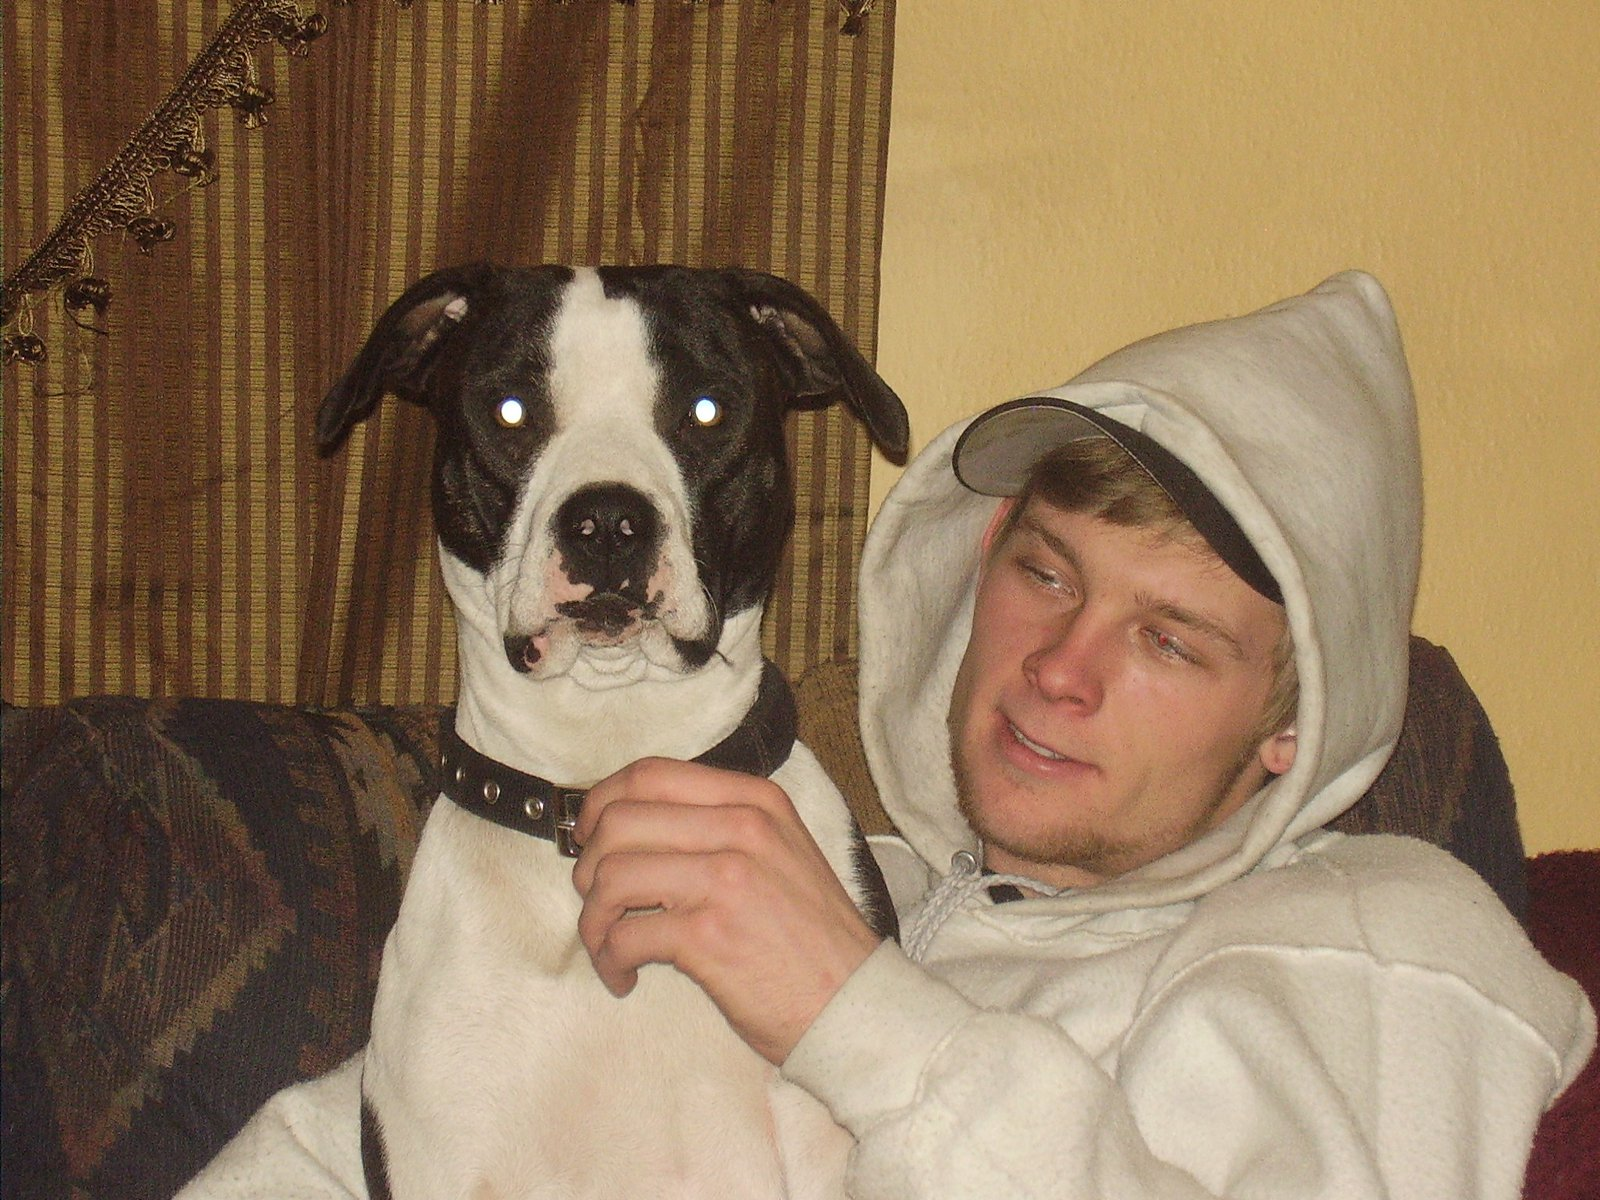 My buddie and my dog